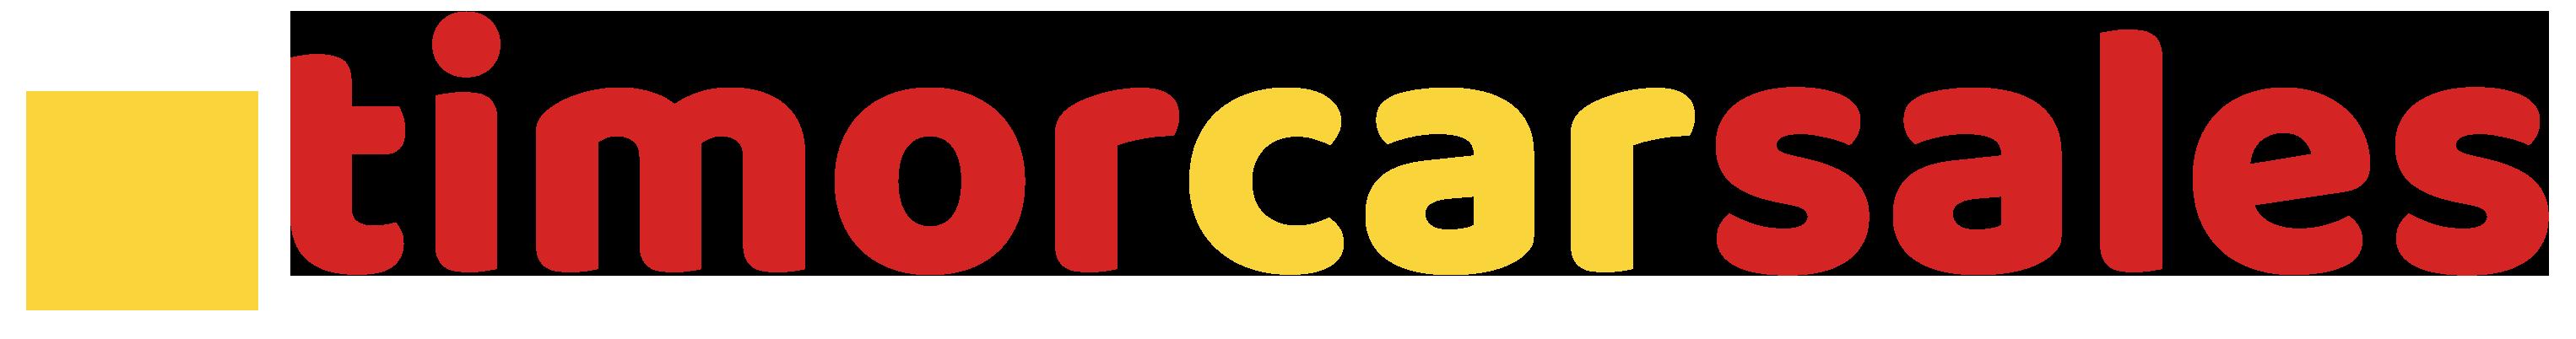 Timorcarsales logo